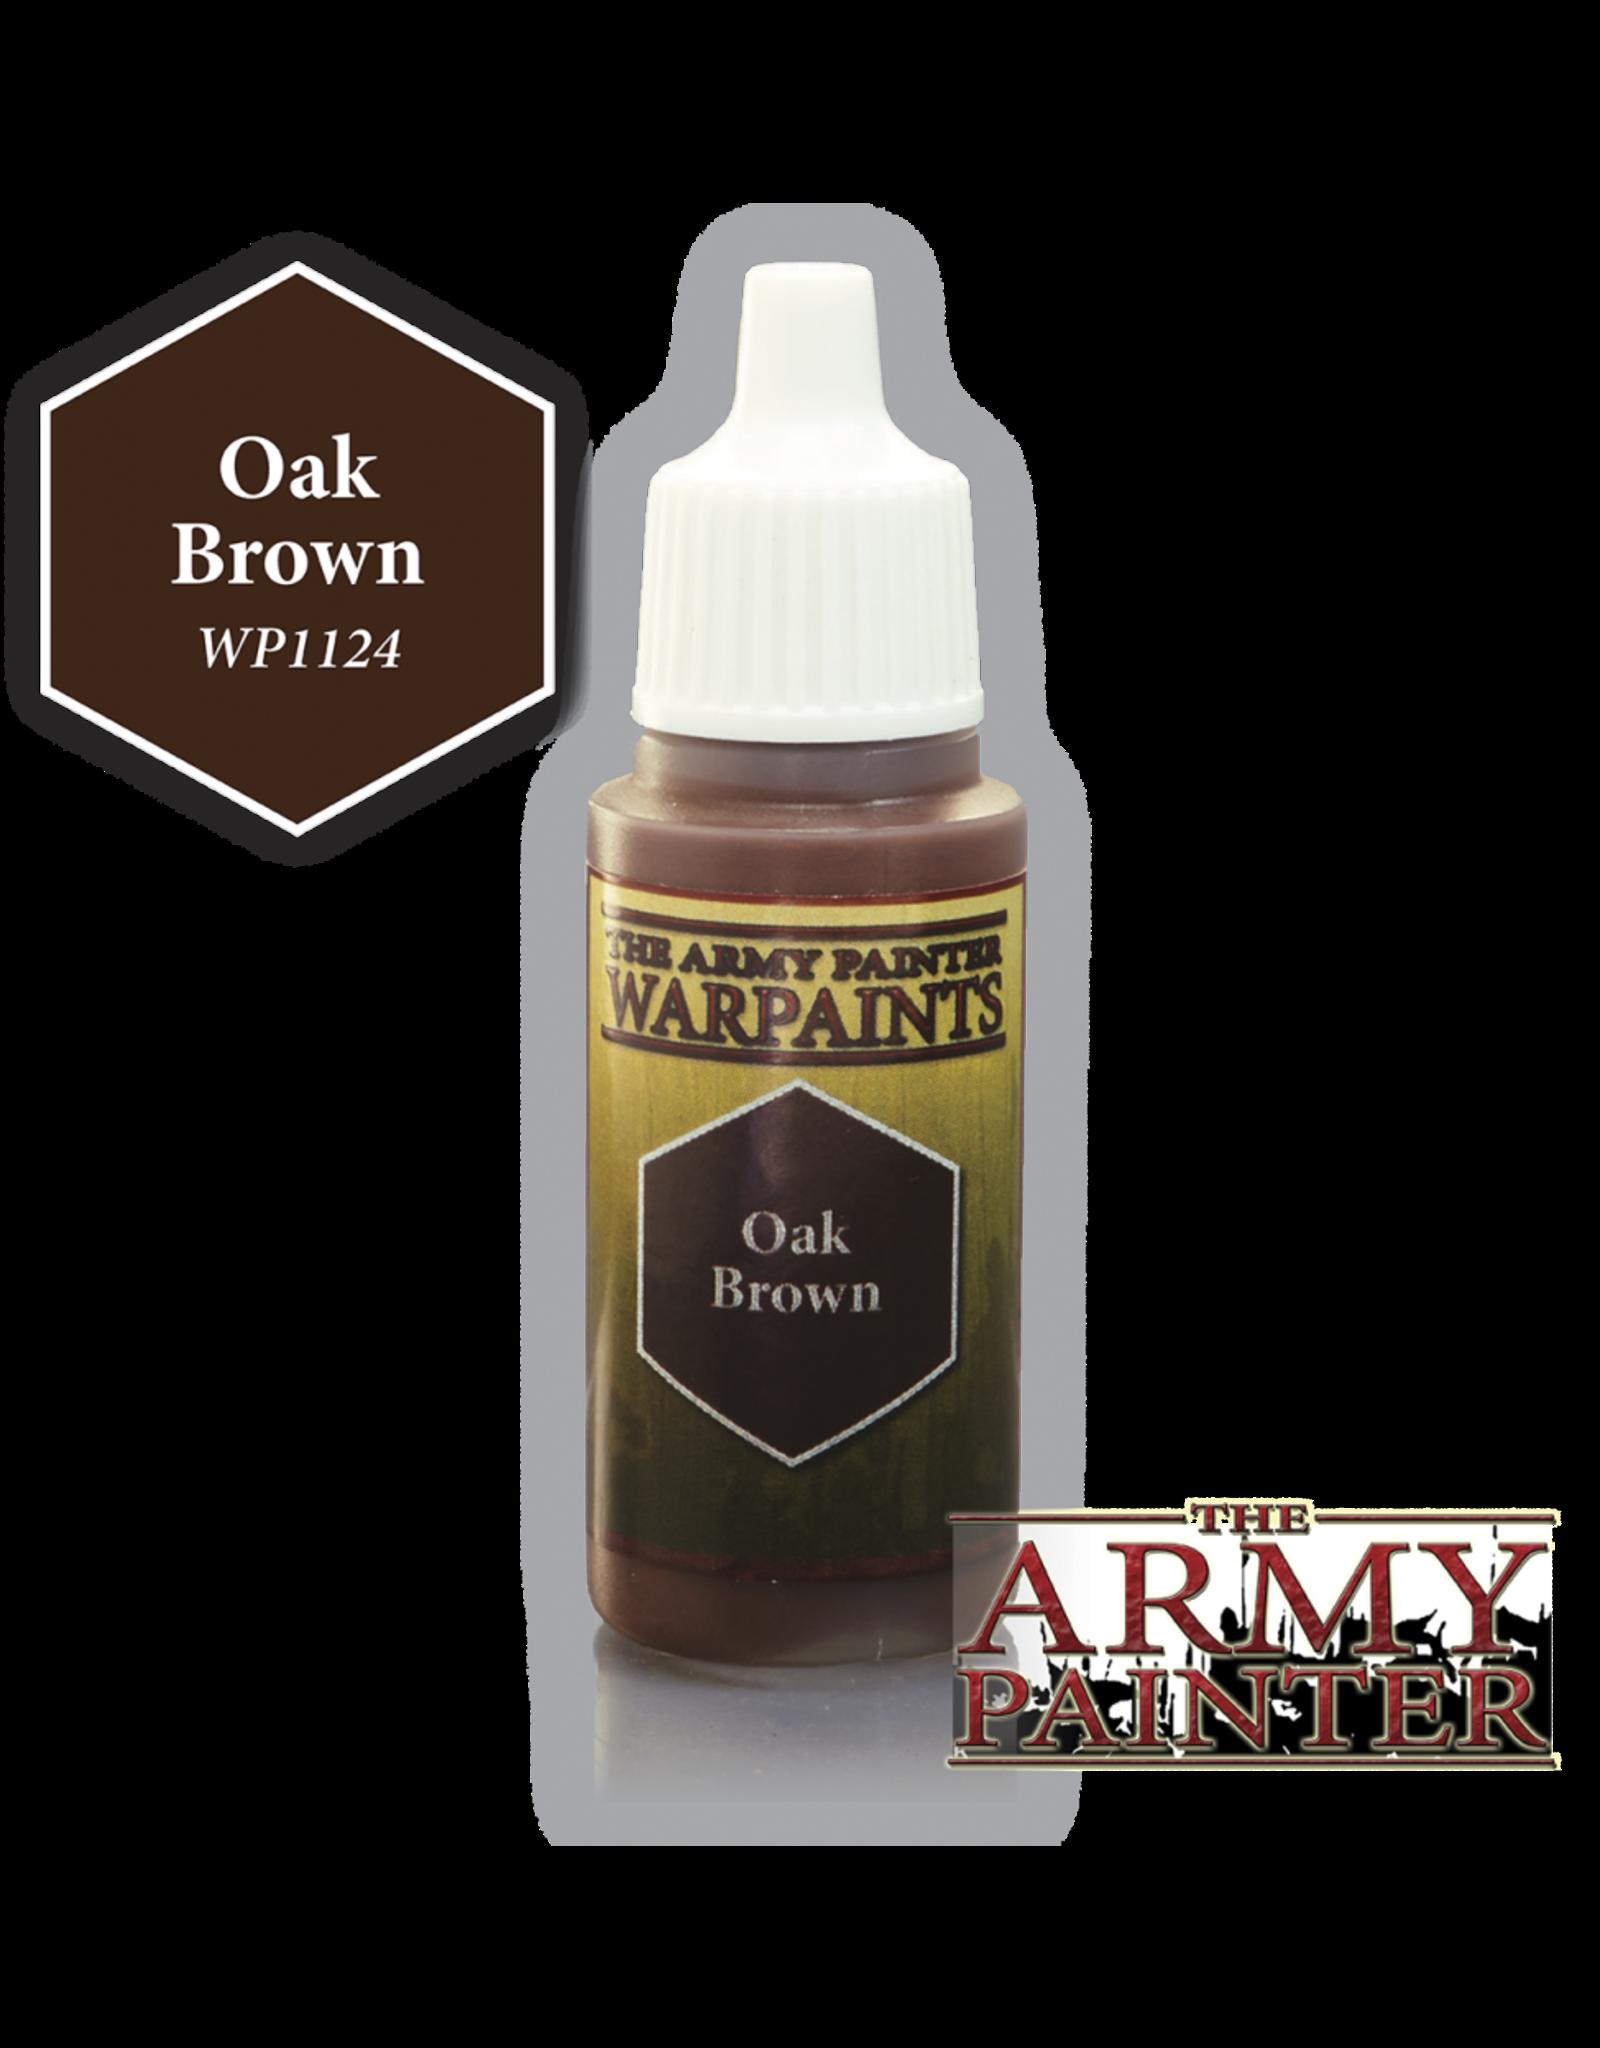 THE ARMY PAINTER ARMY PAINTER WARPAINTS OAK BROWN